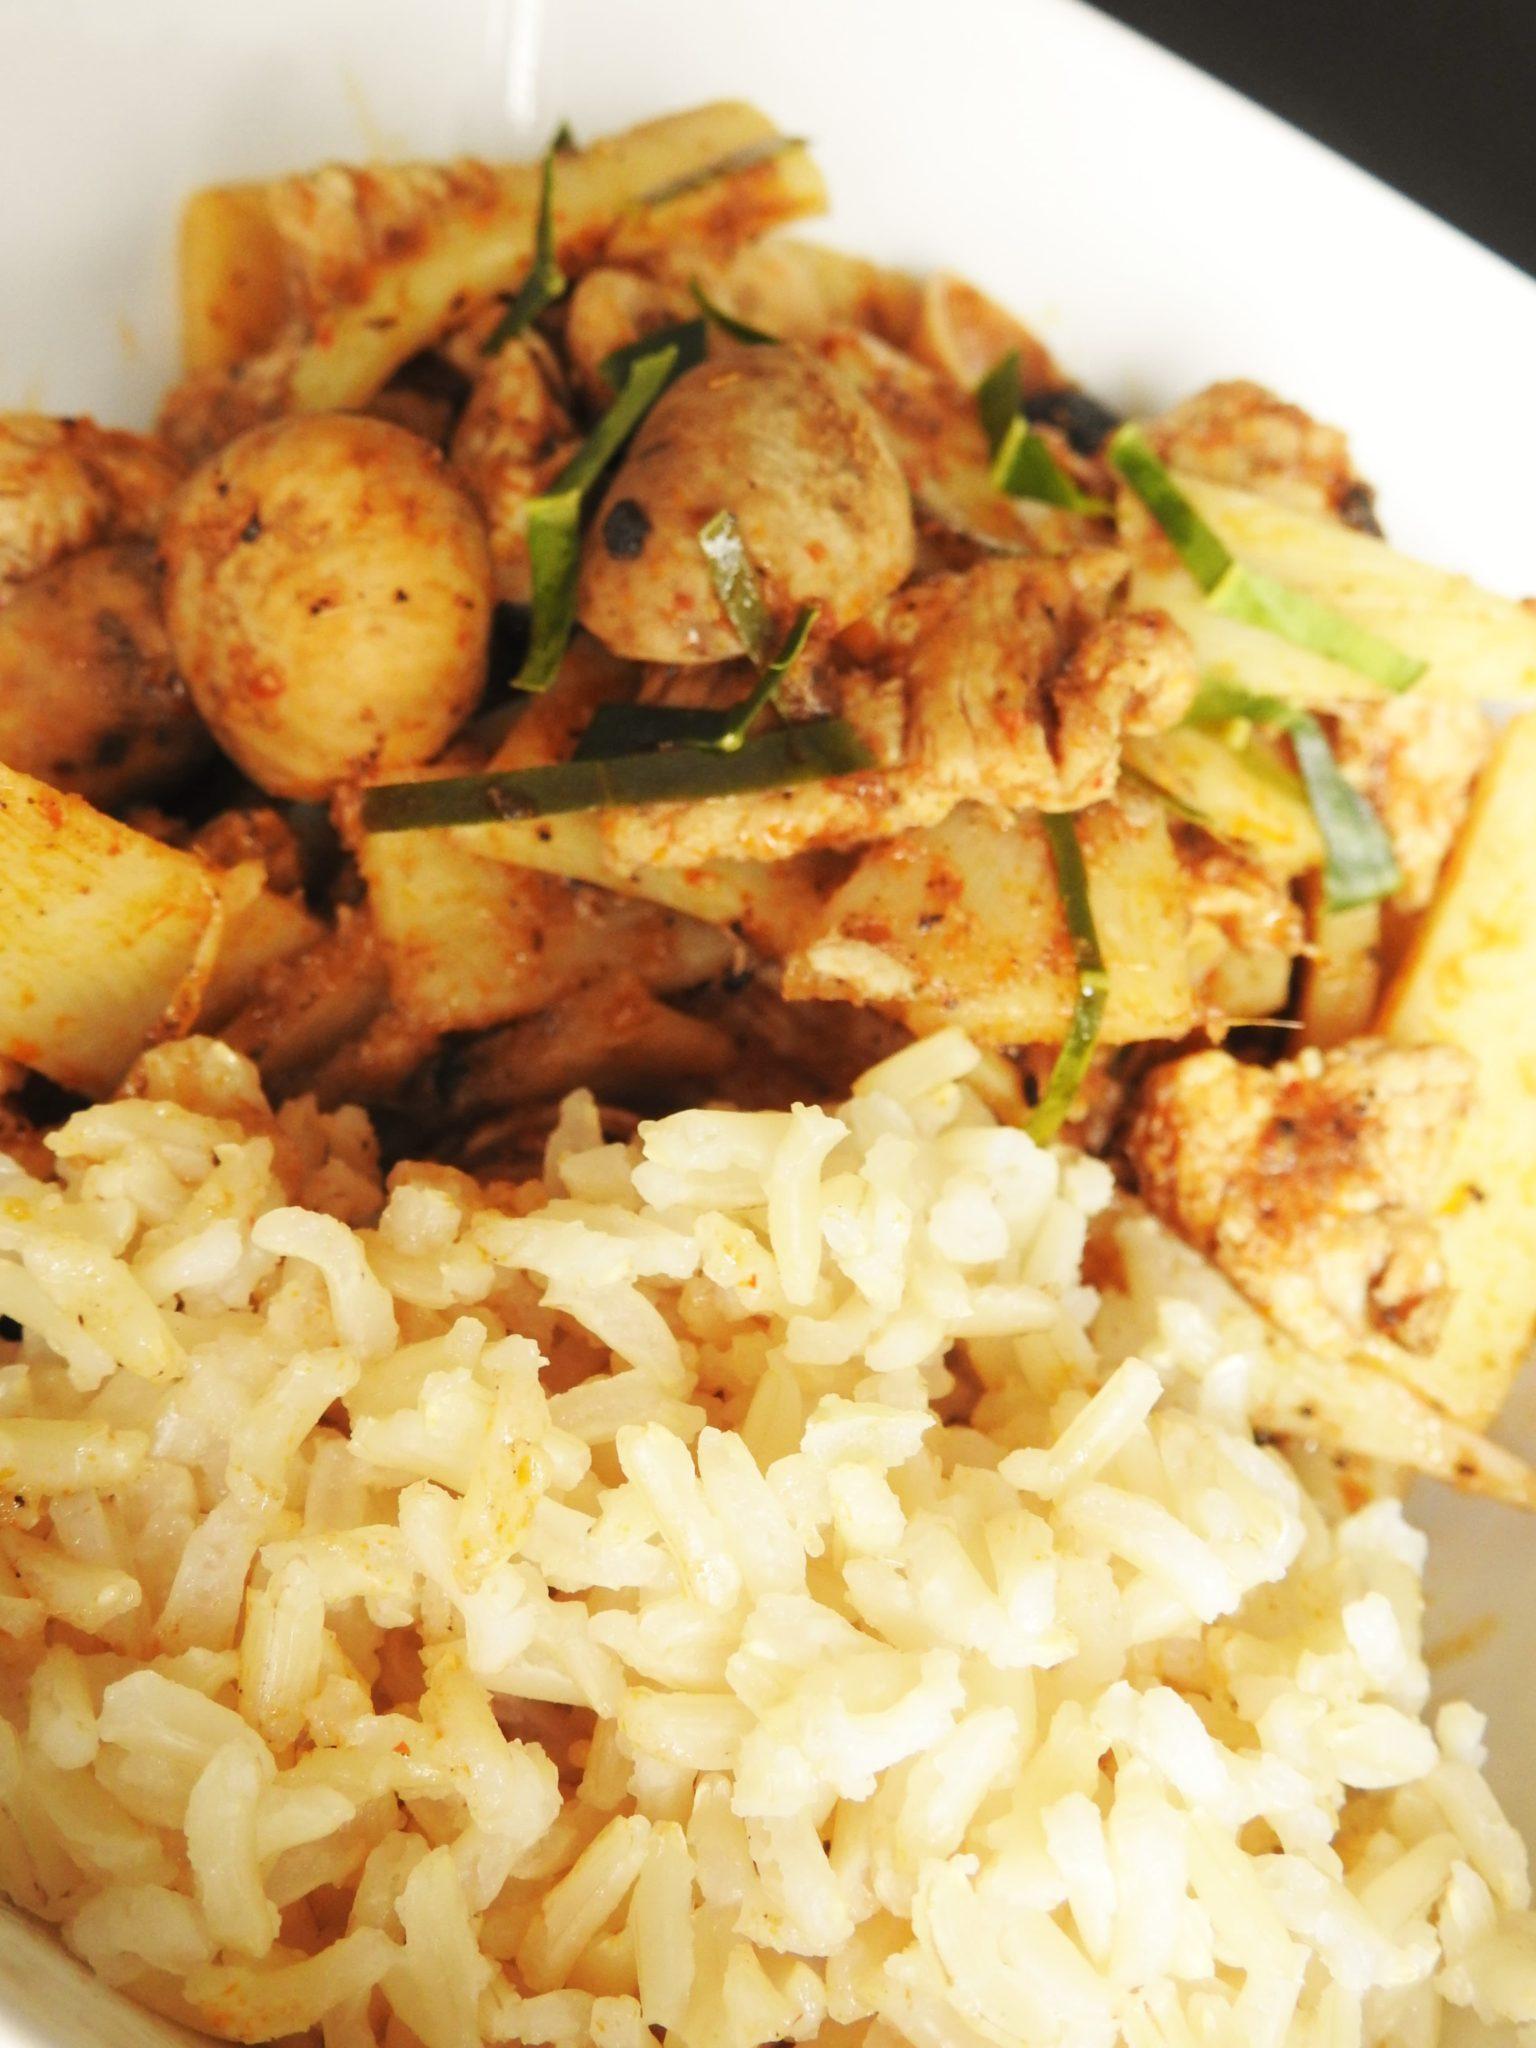 Spicy Thai Puffball Mushroom with Pork